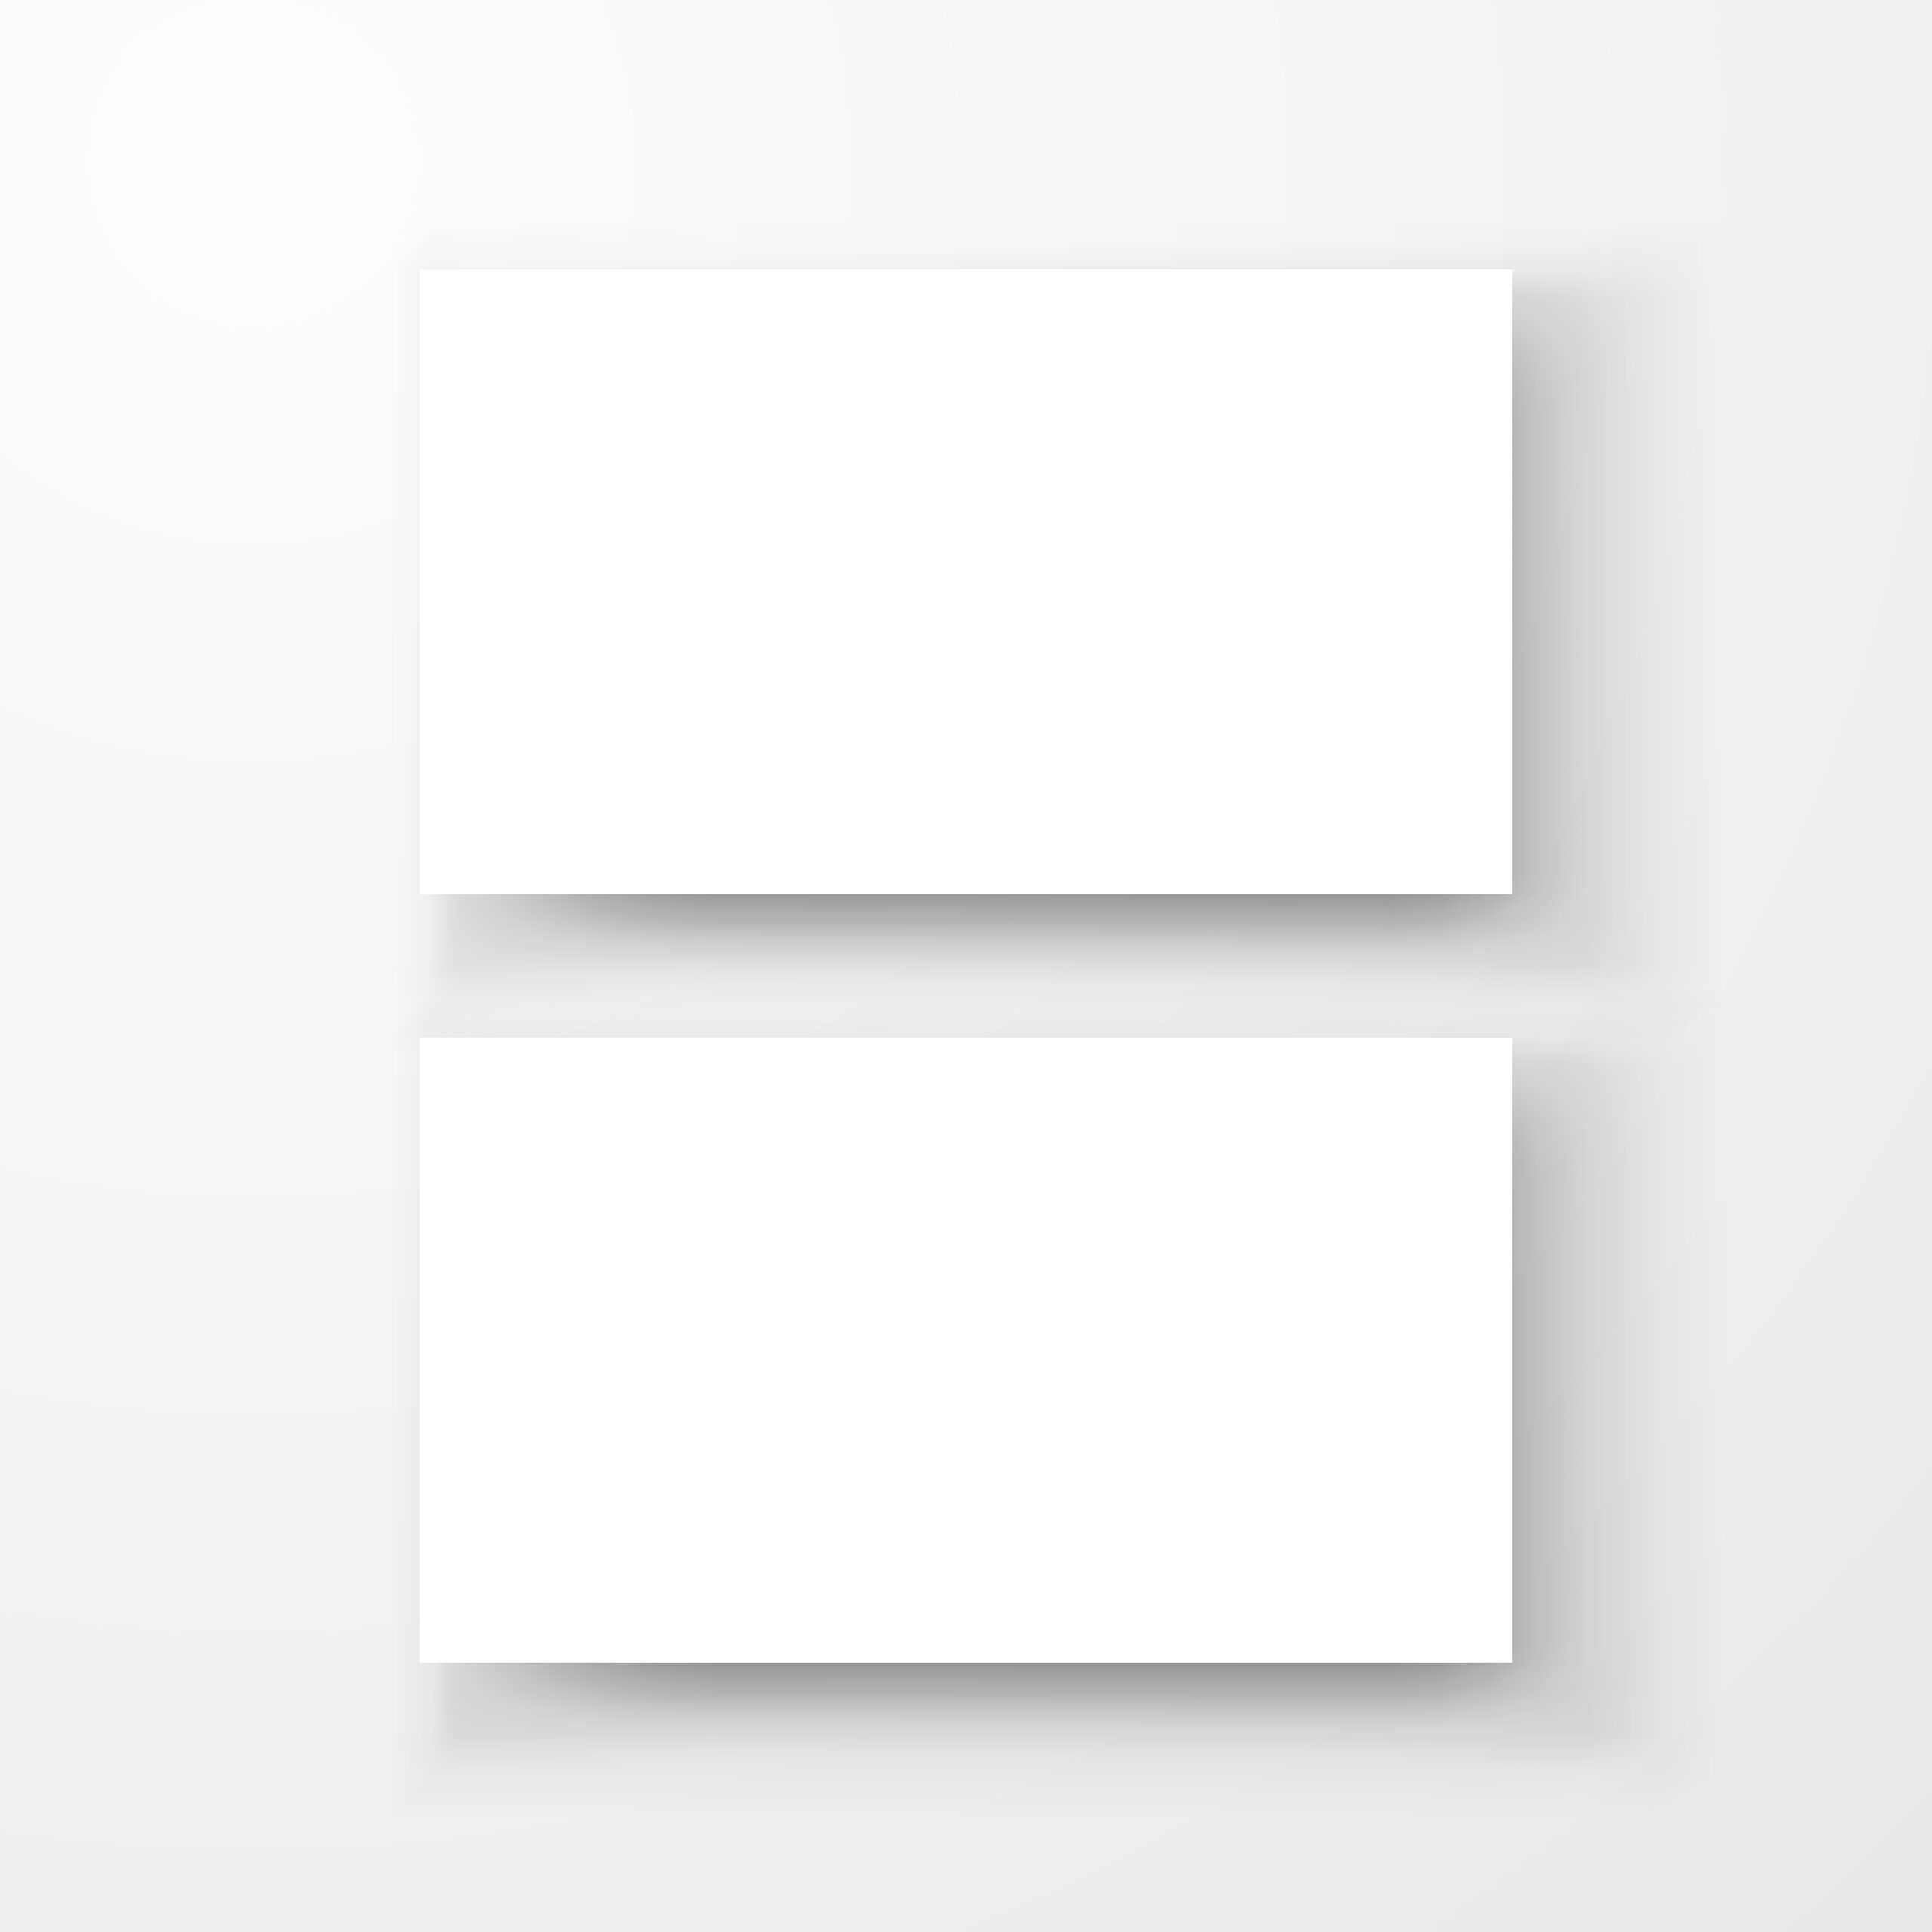 Blank Business Card Mockup Template Createdvector For Plain Business Card Template